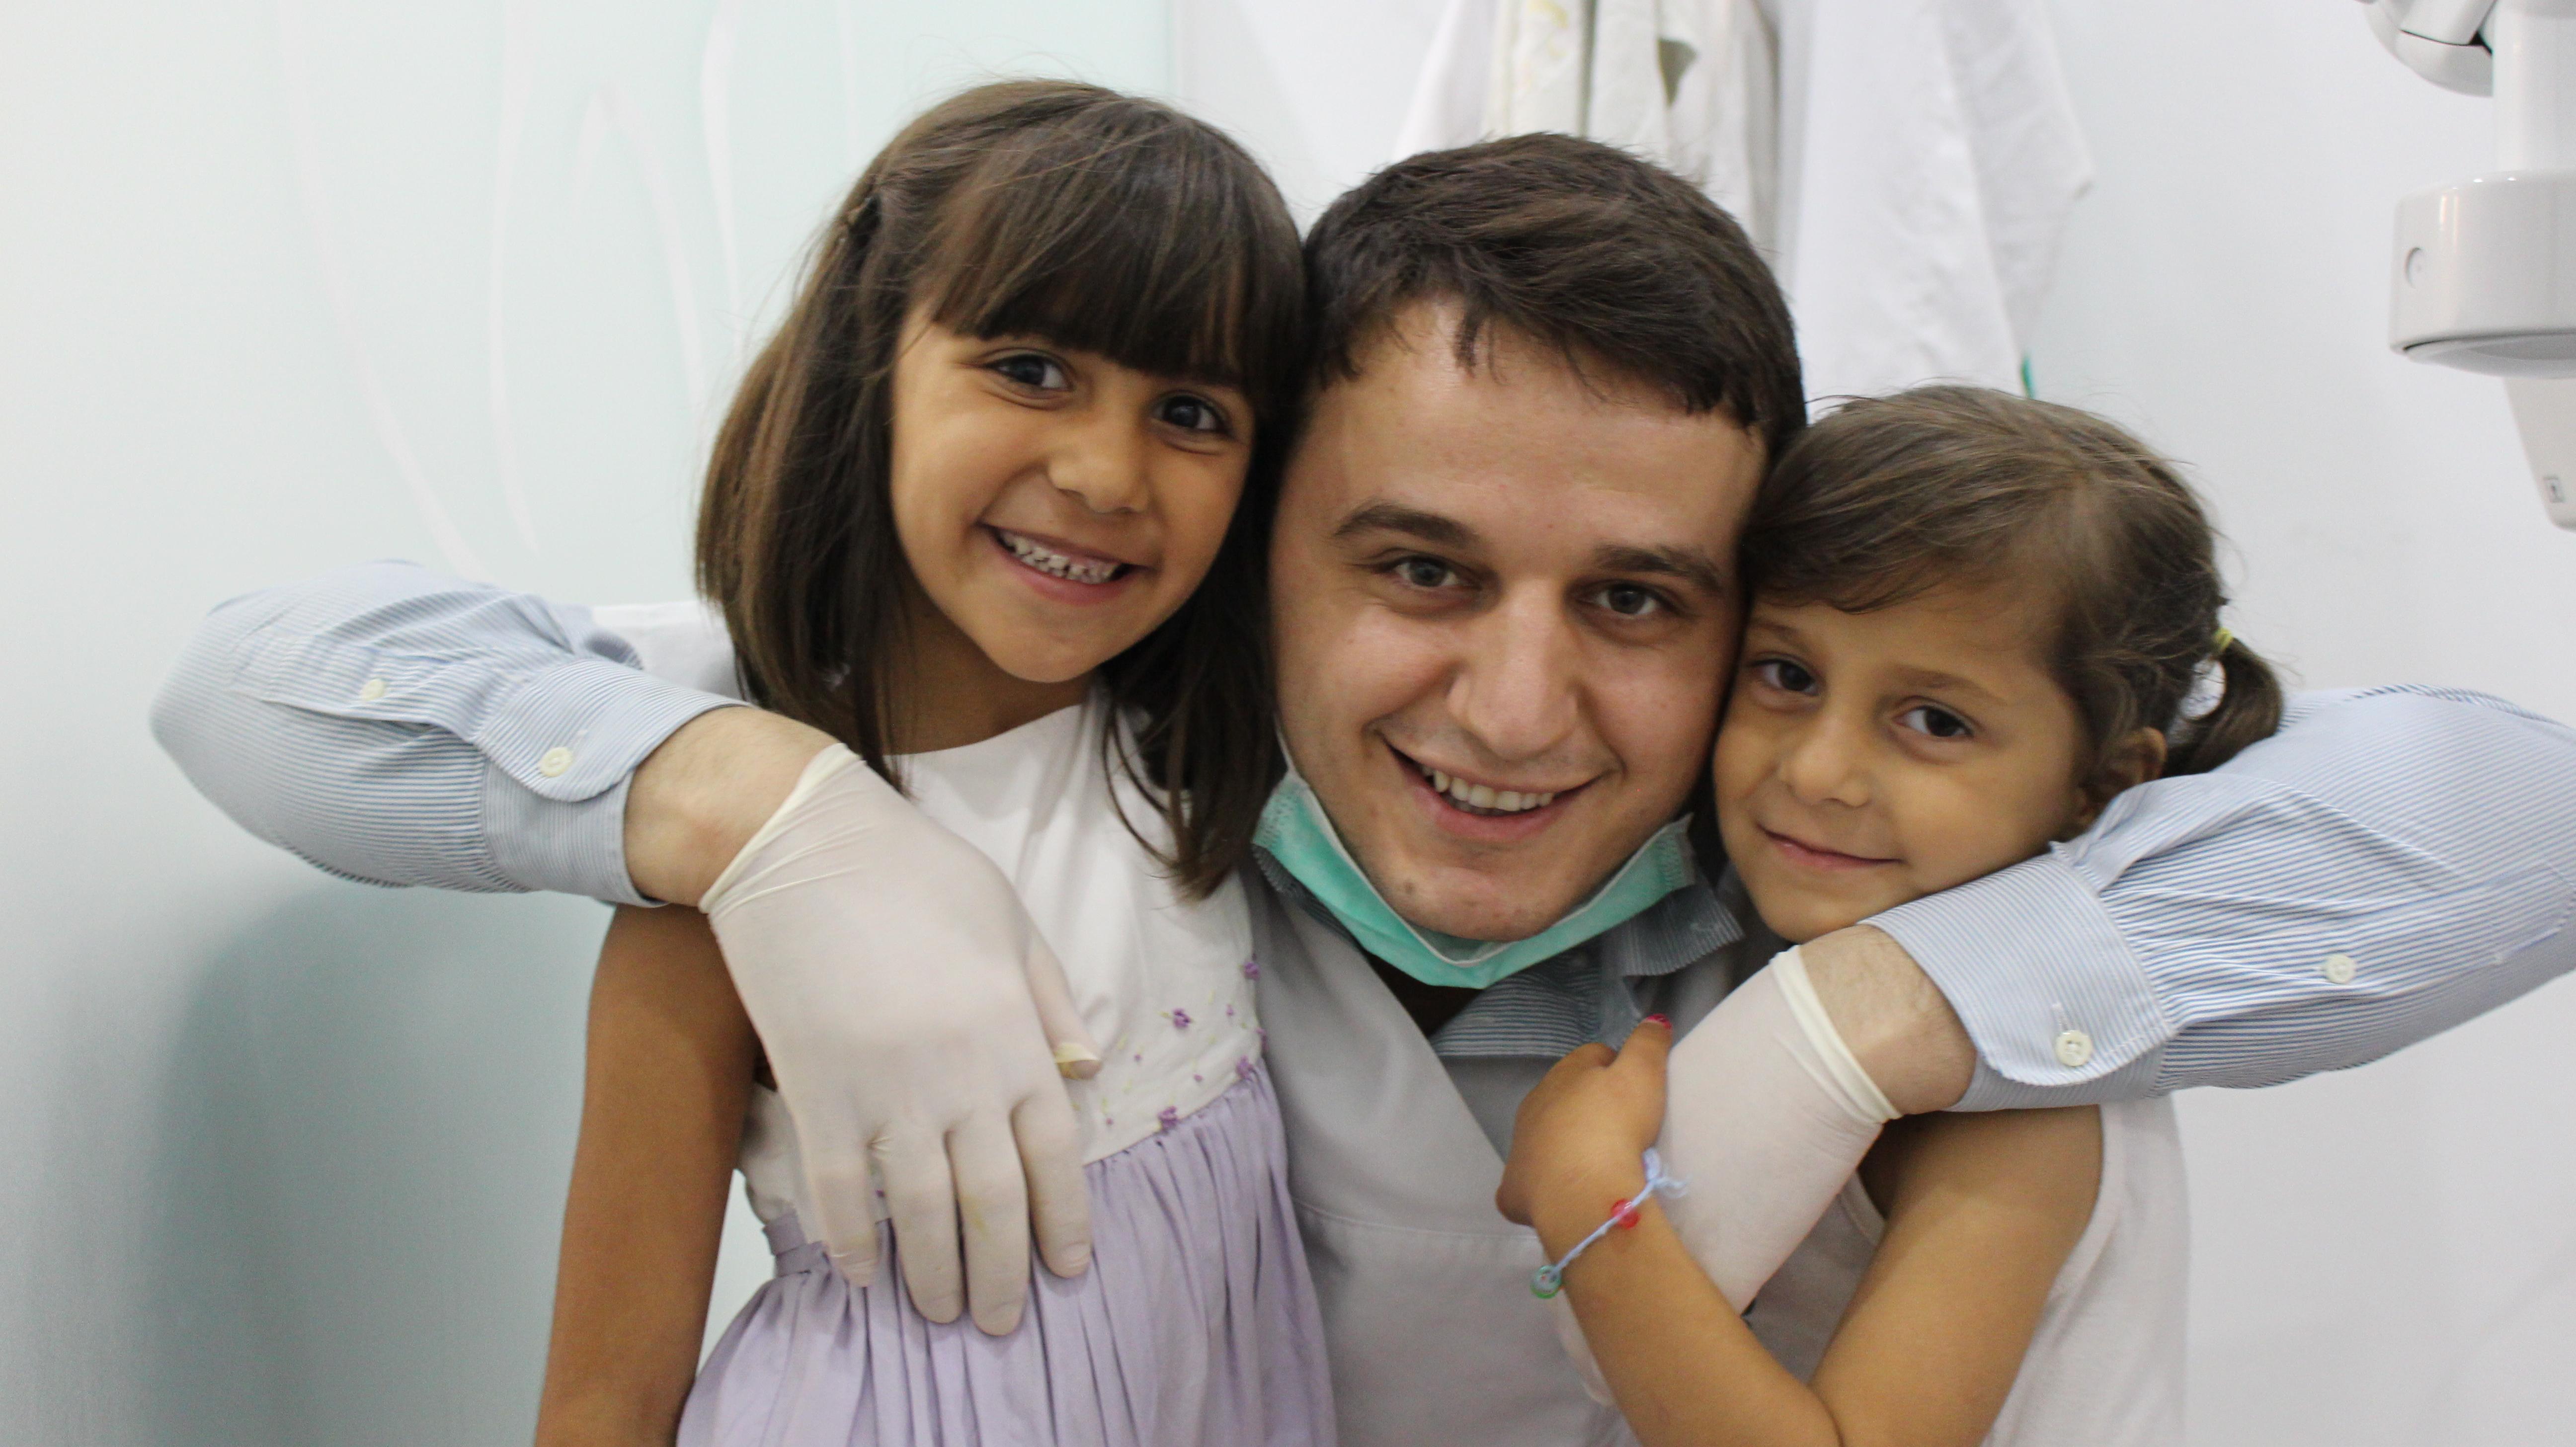 Everyone likes Dr. Zamiri